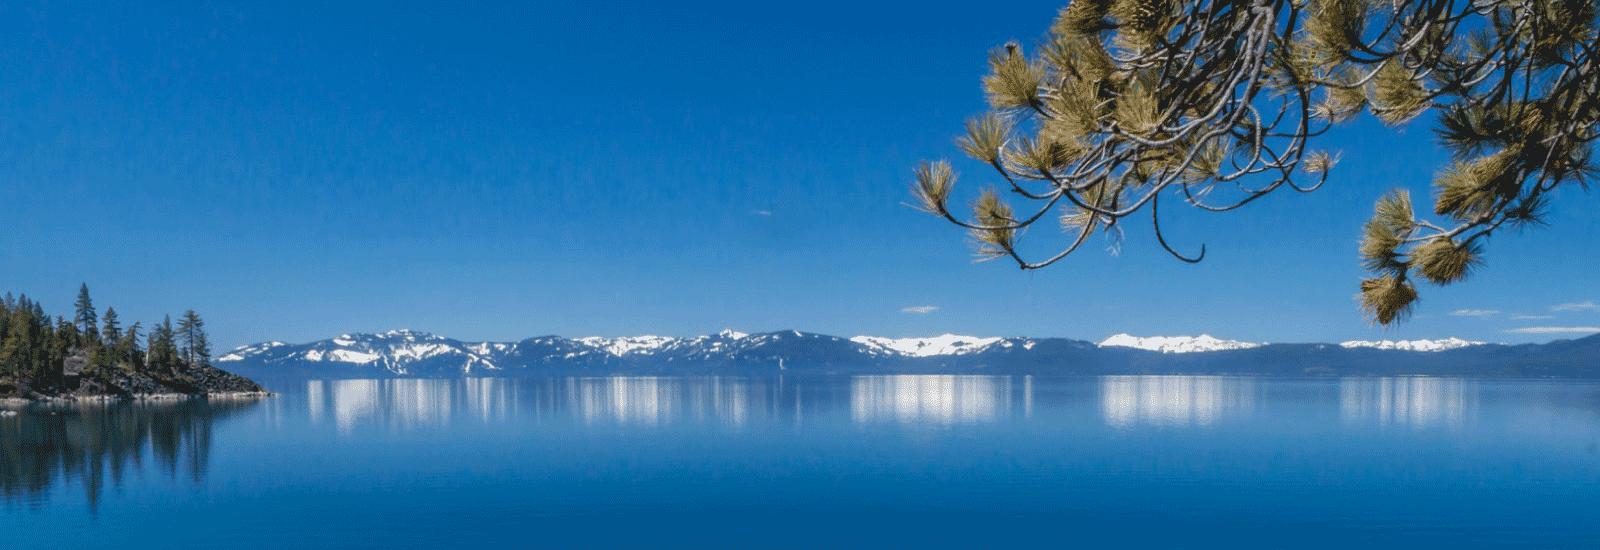 Lake Tahoe Recreational Lodging, California